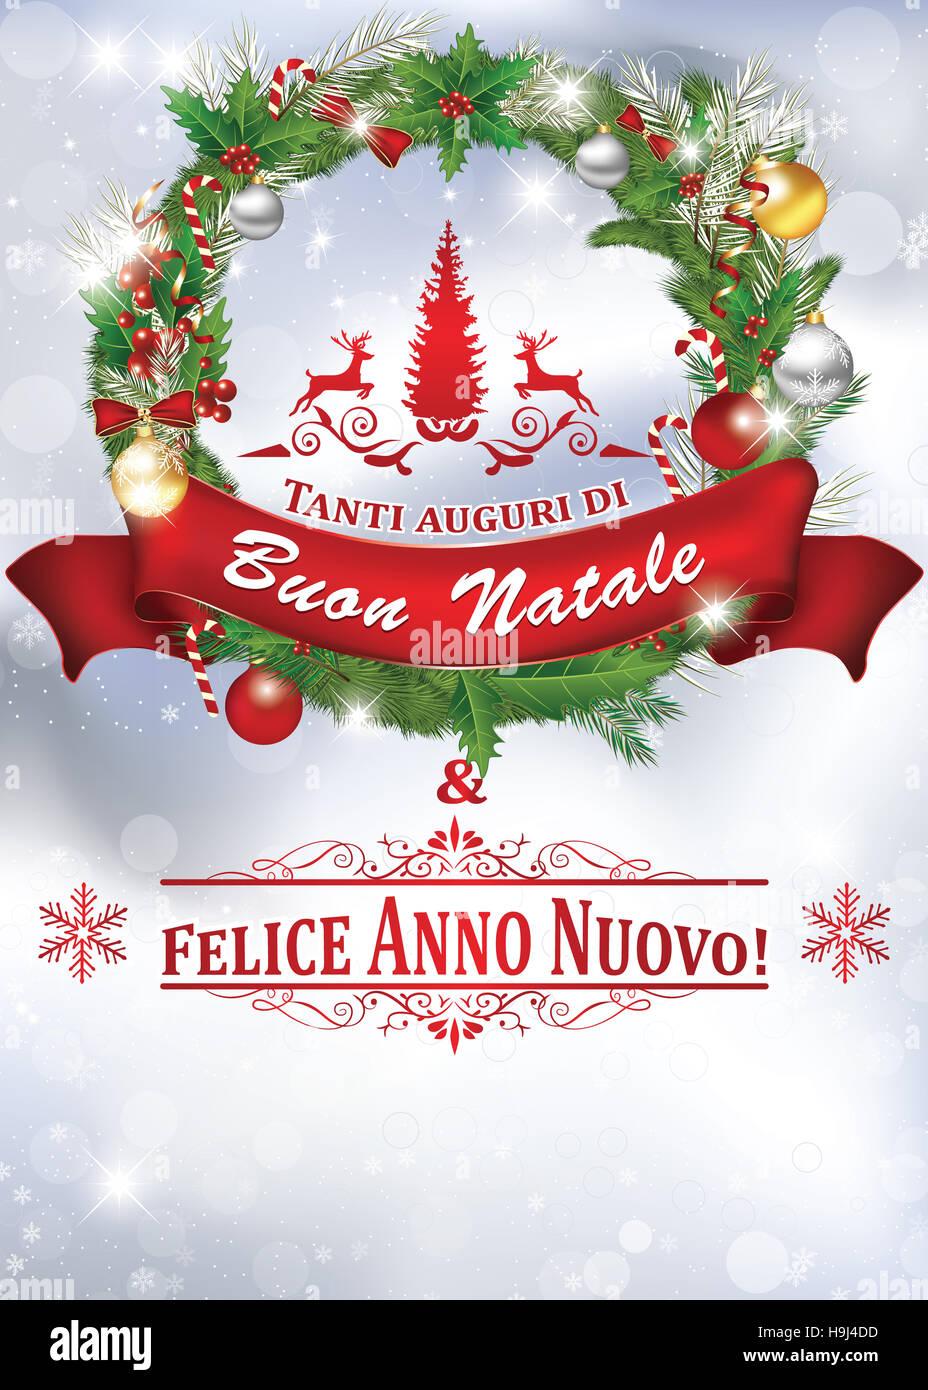 Frasi Auguri Buon Natale E Felice Anno Nuovo.Tanti Auguri Imagenes De Stock Tanti Auguri Fotos De Stock